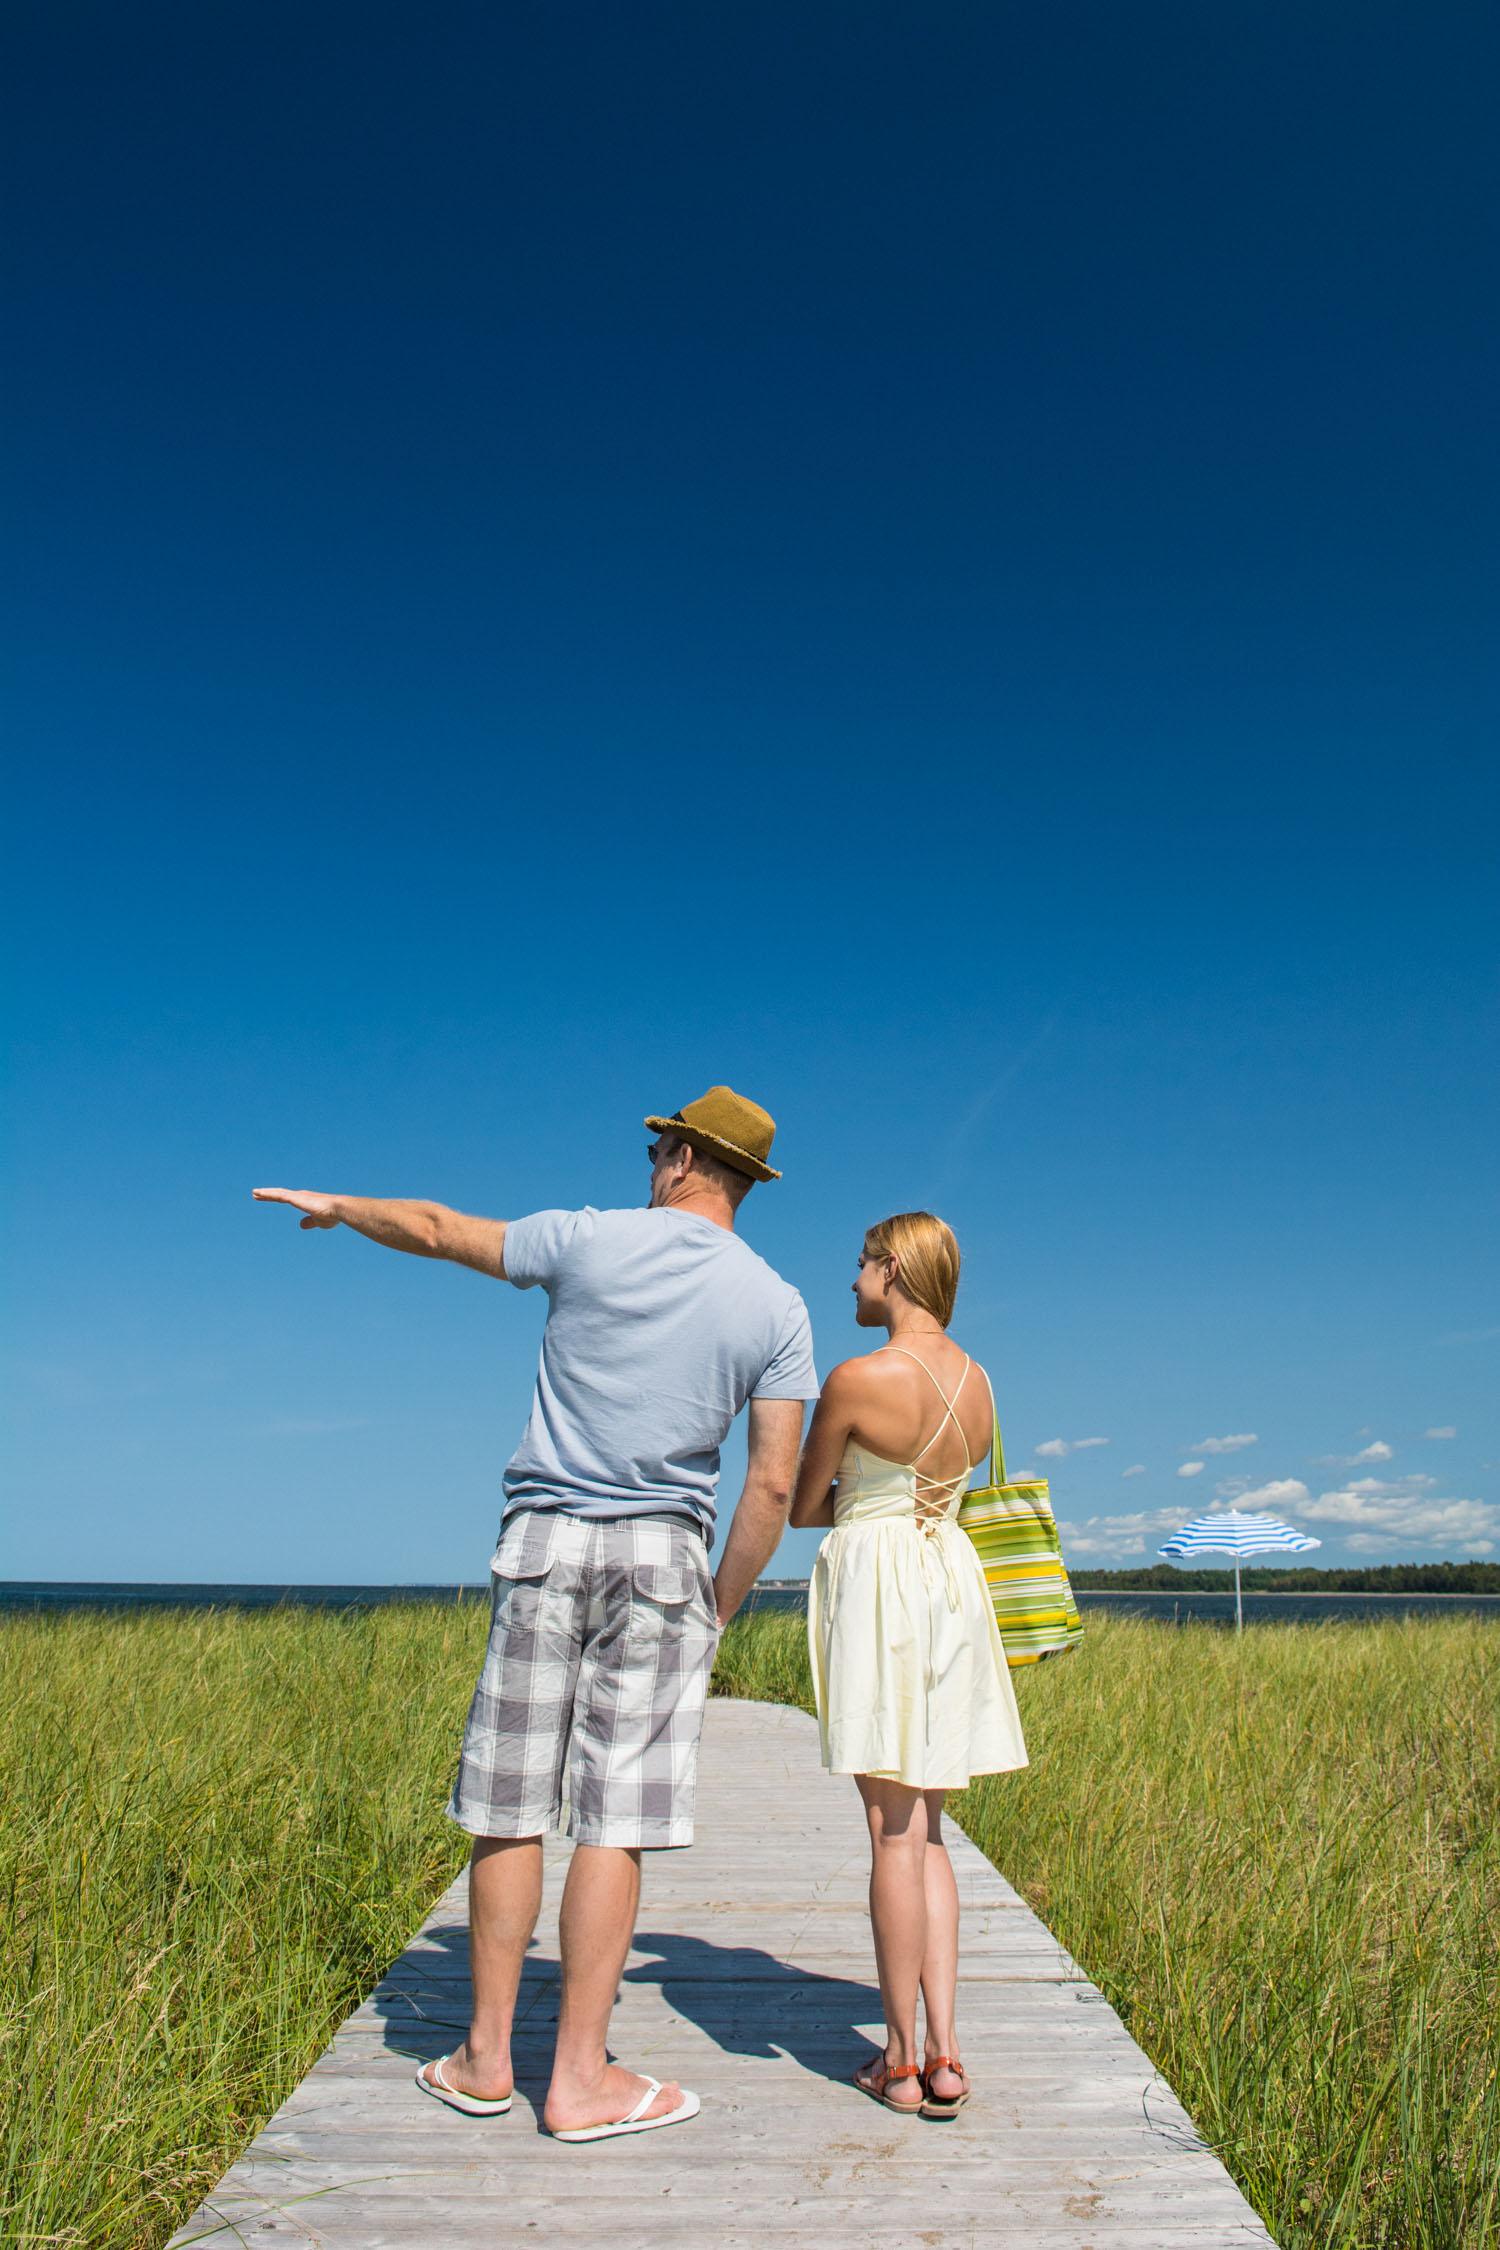 aug10-15 2014-Tourism New Brunswick-T4G Kick-summer 2014-Miramichi-Bathurst-Caraquet-Shippagan-Miscou Island-NB-web res jpg-photo by Aaron McKenzie Fraser-www.amfraser.com_AMF1314.jpg